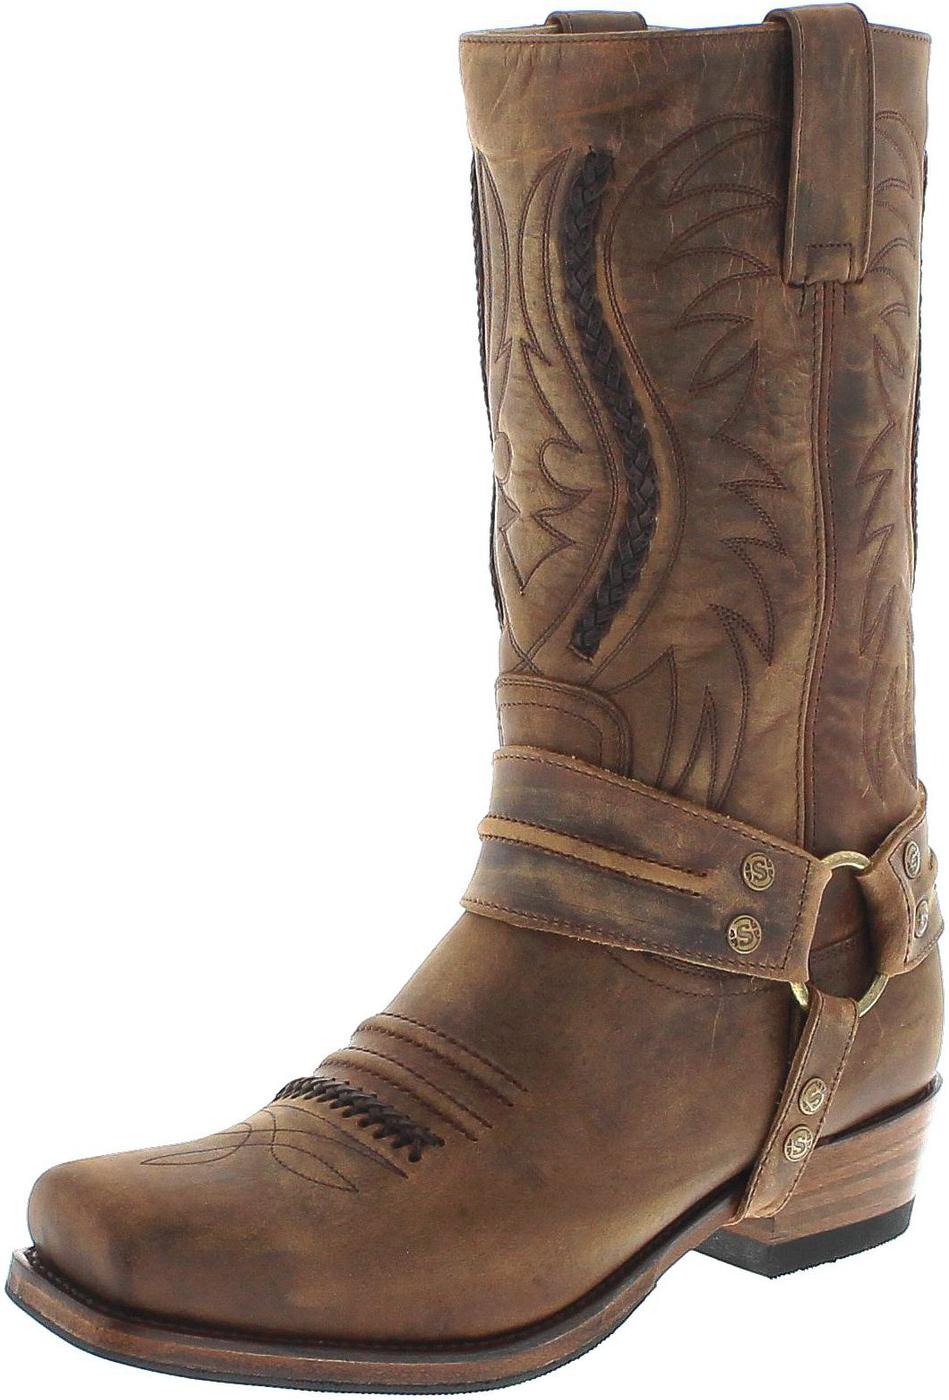 Sendra Boots 12209 Mad Dog Tang Lavado Motorlaarzen - bruin